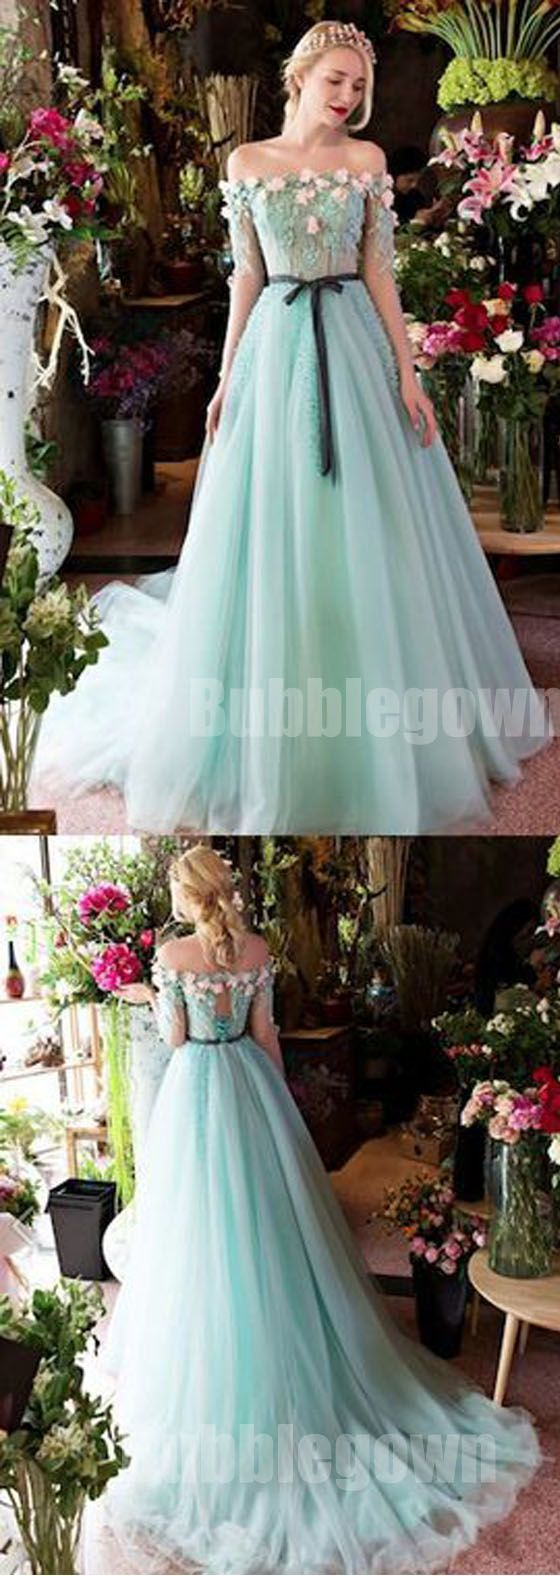 3182 best WEDDING DRESS UP COLOR MY WORLD / 2 images on Pinterest ...